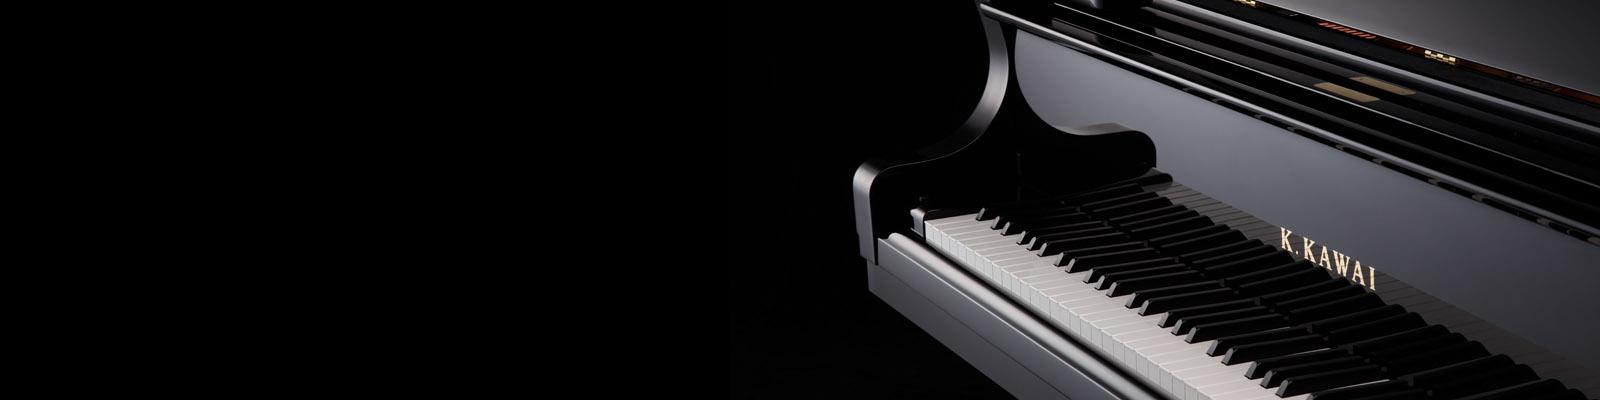 Pianist Paul Hombach ist, Musiker, Comedian auf K. Kawai Piano oder Flügel